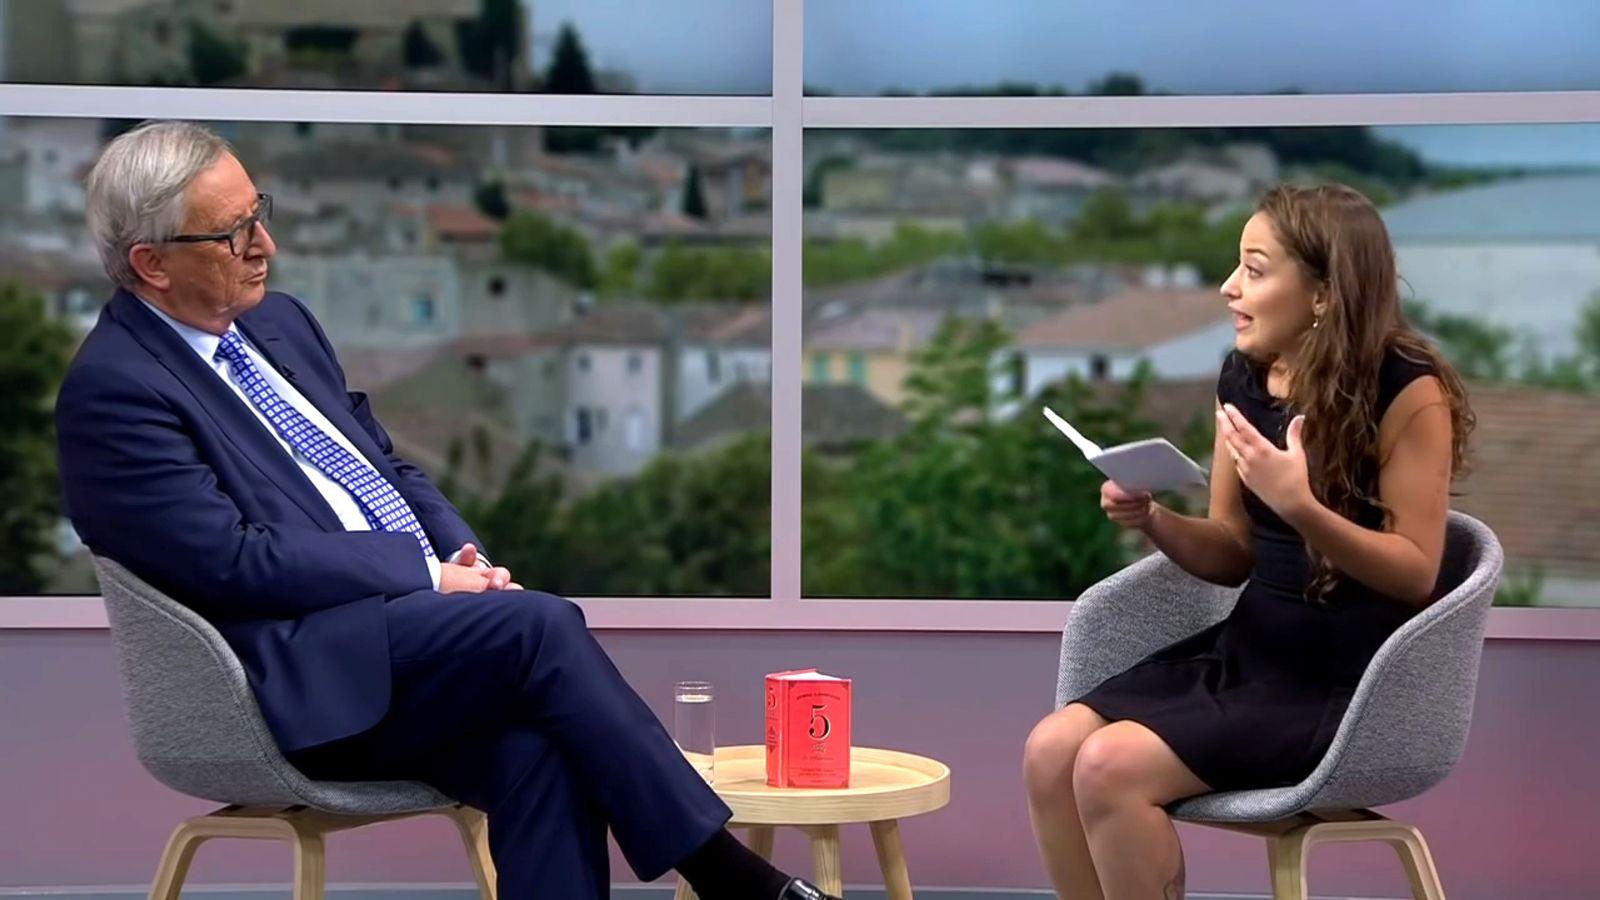 NUR ALS ZITAT Screenshot YouTube Interview mit President Juncker/ Nadji